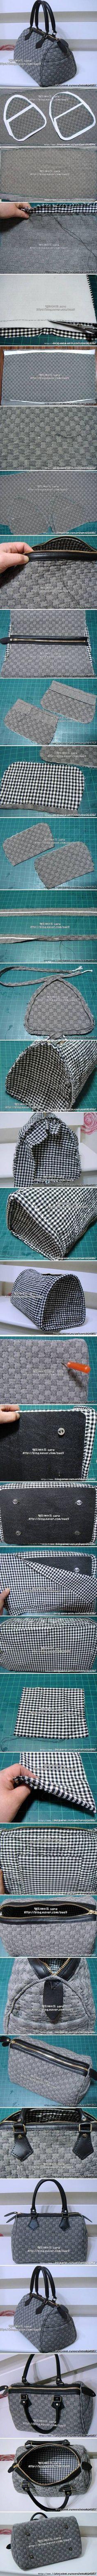 DIY Nice Fashionable Handbag #handbagdiy